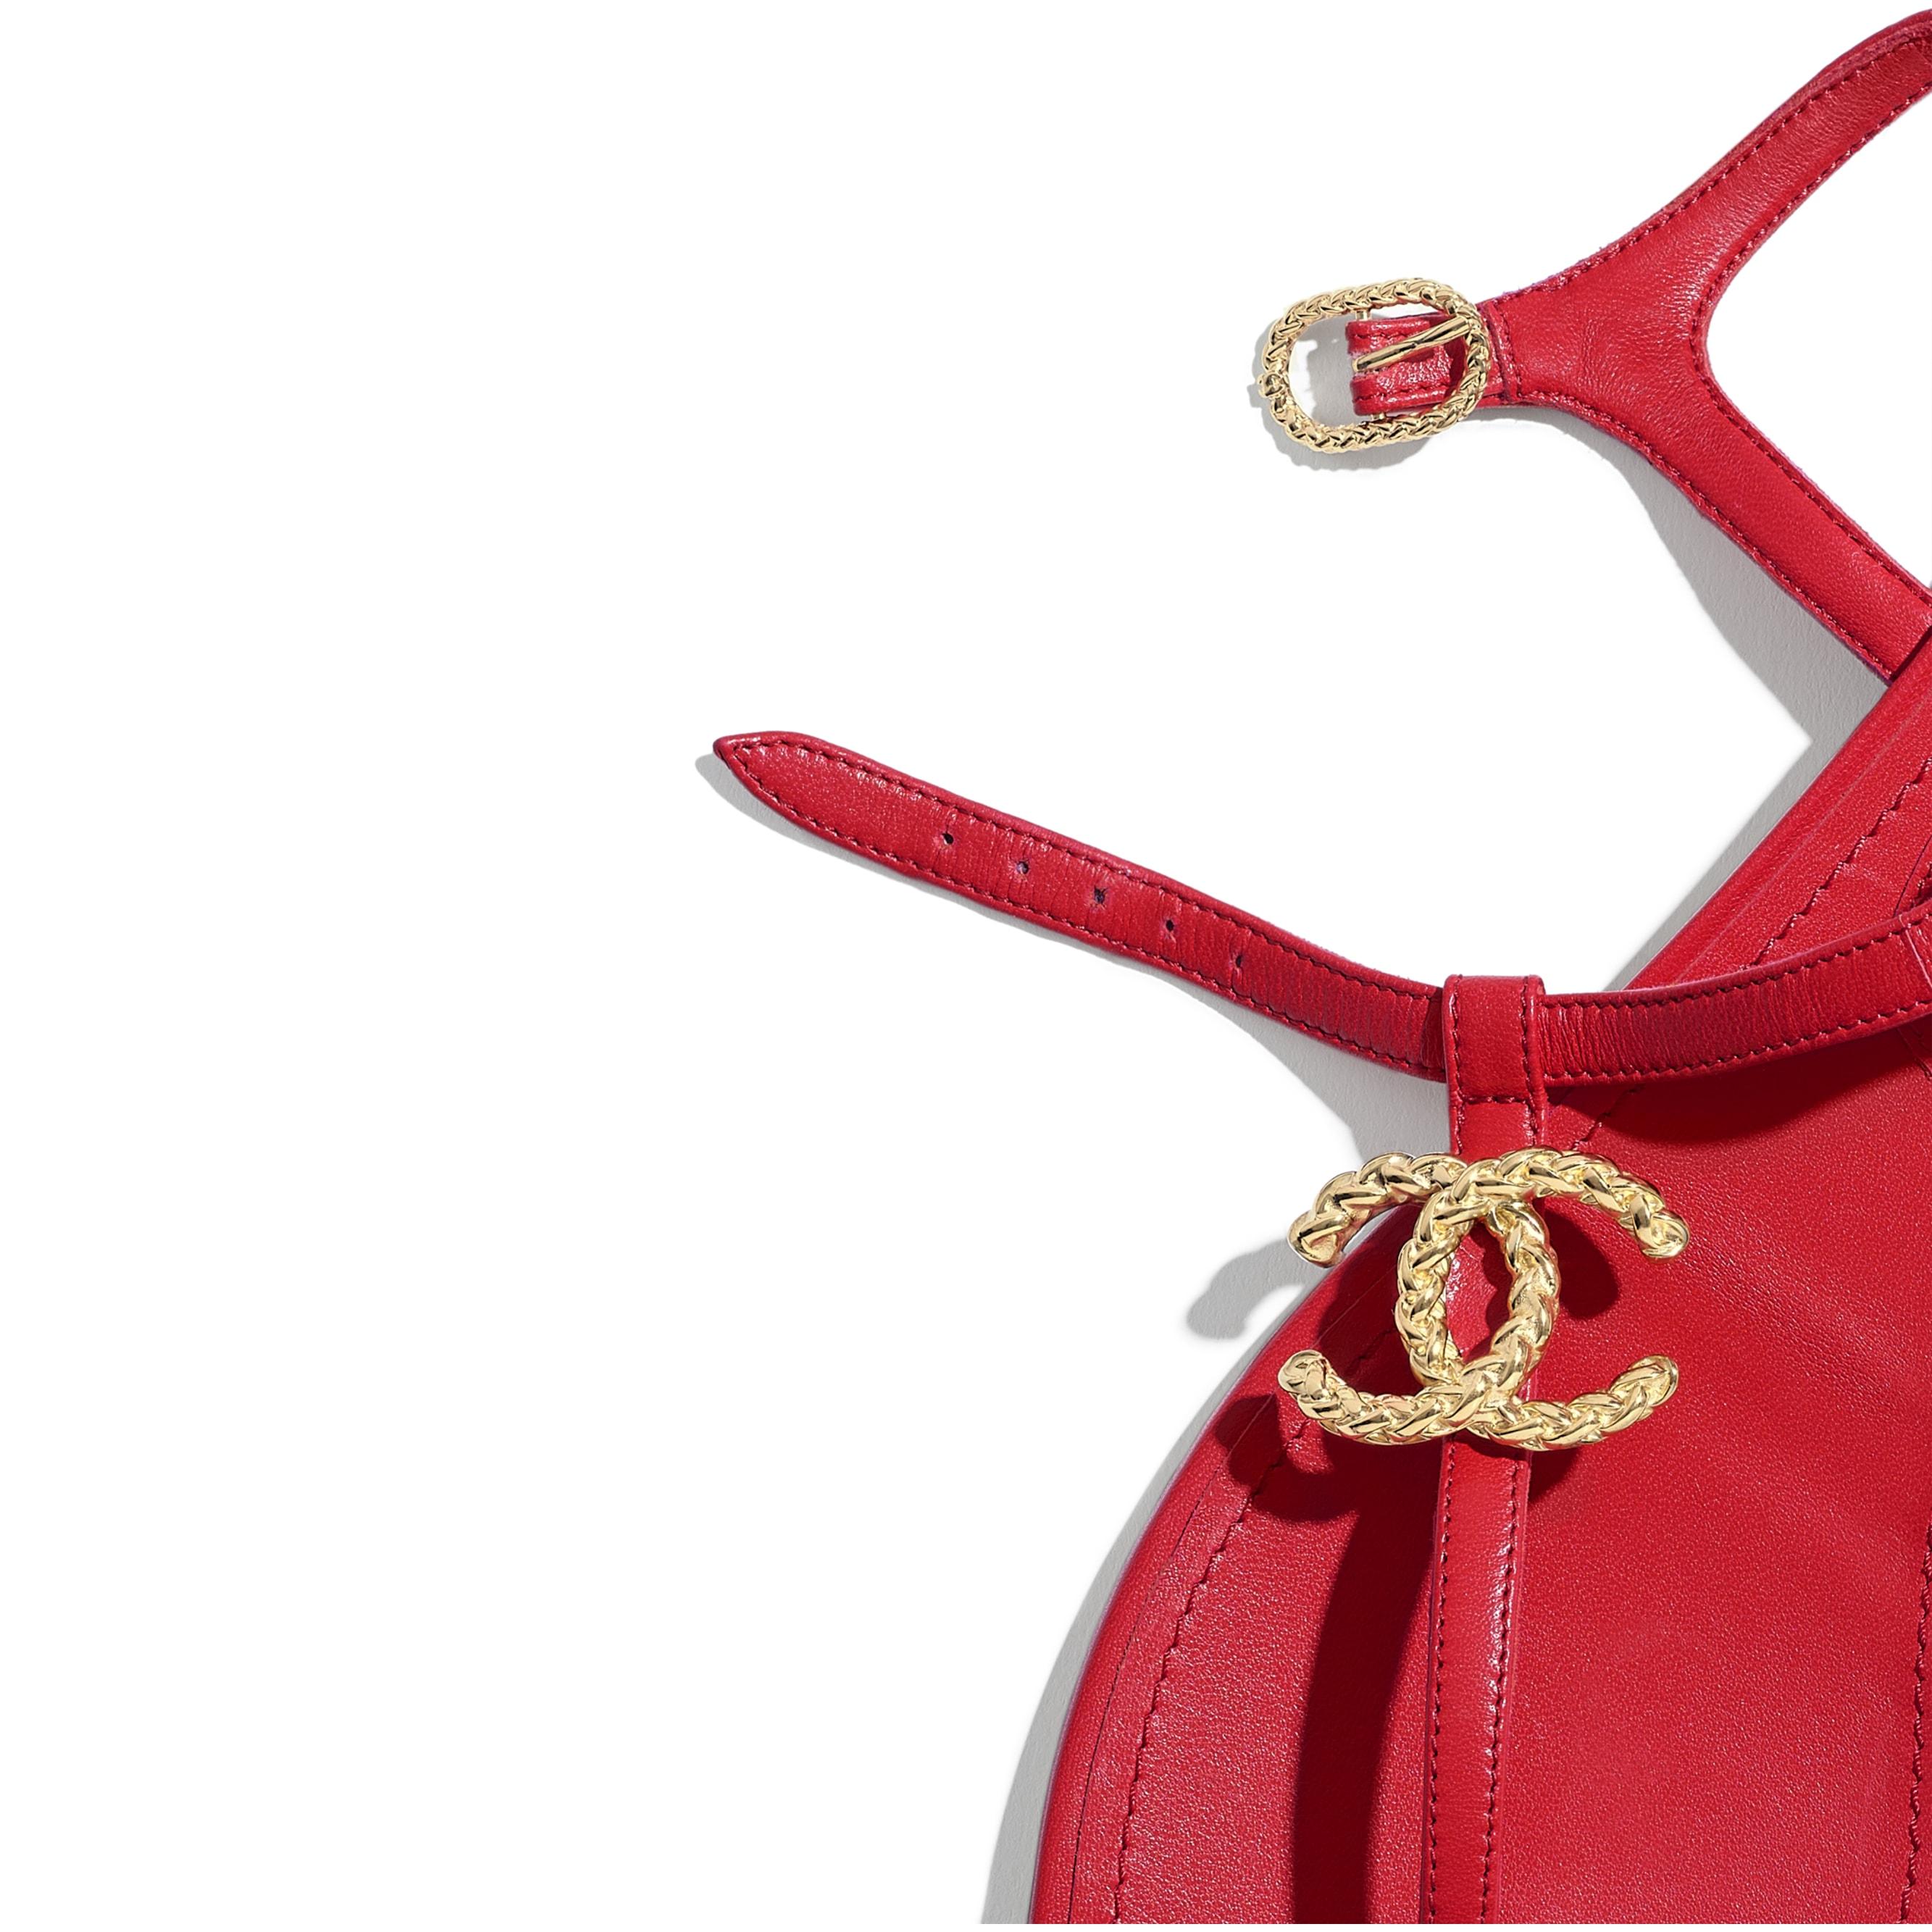 Sandalen - Rot - Lammleder - CHANEL - Extra-Ansicht - Standardgröße anzeigen